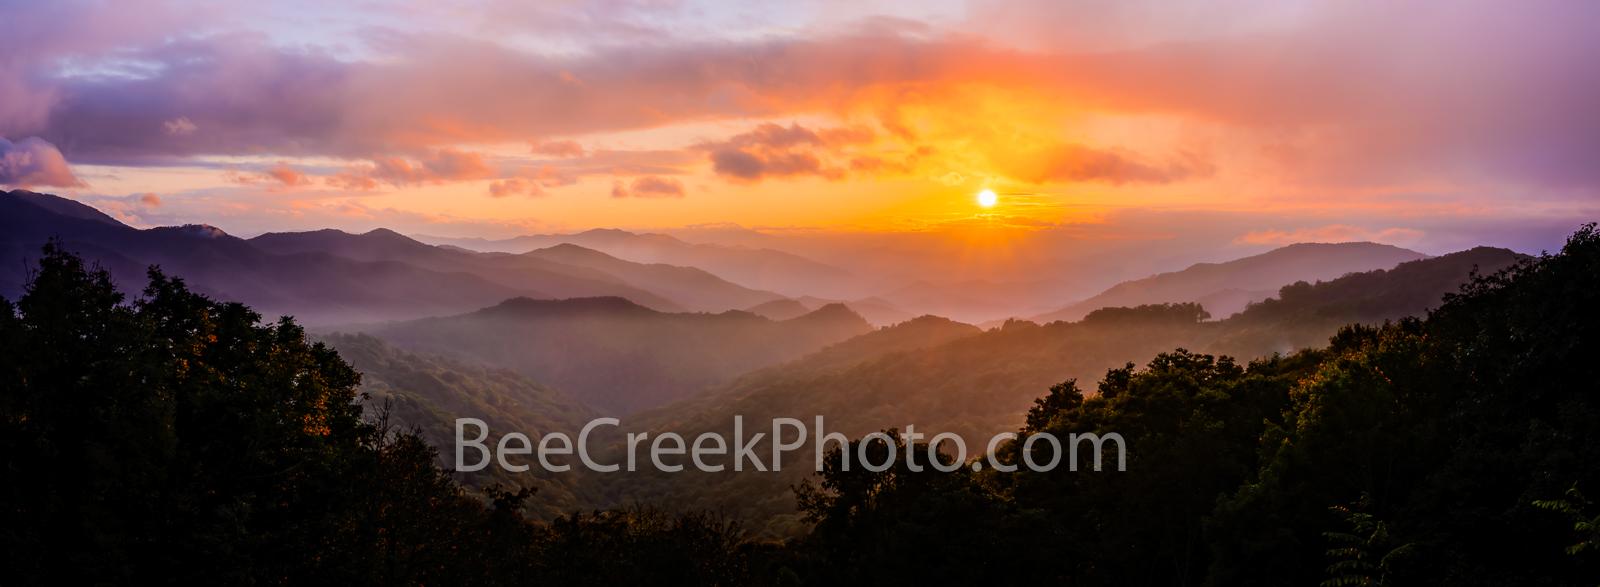 Blue Ridge Mountain Sunset Pano - Another capture of the blue ridge mountains at sunset with this smoky haze which the Smoky...